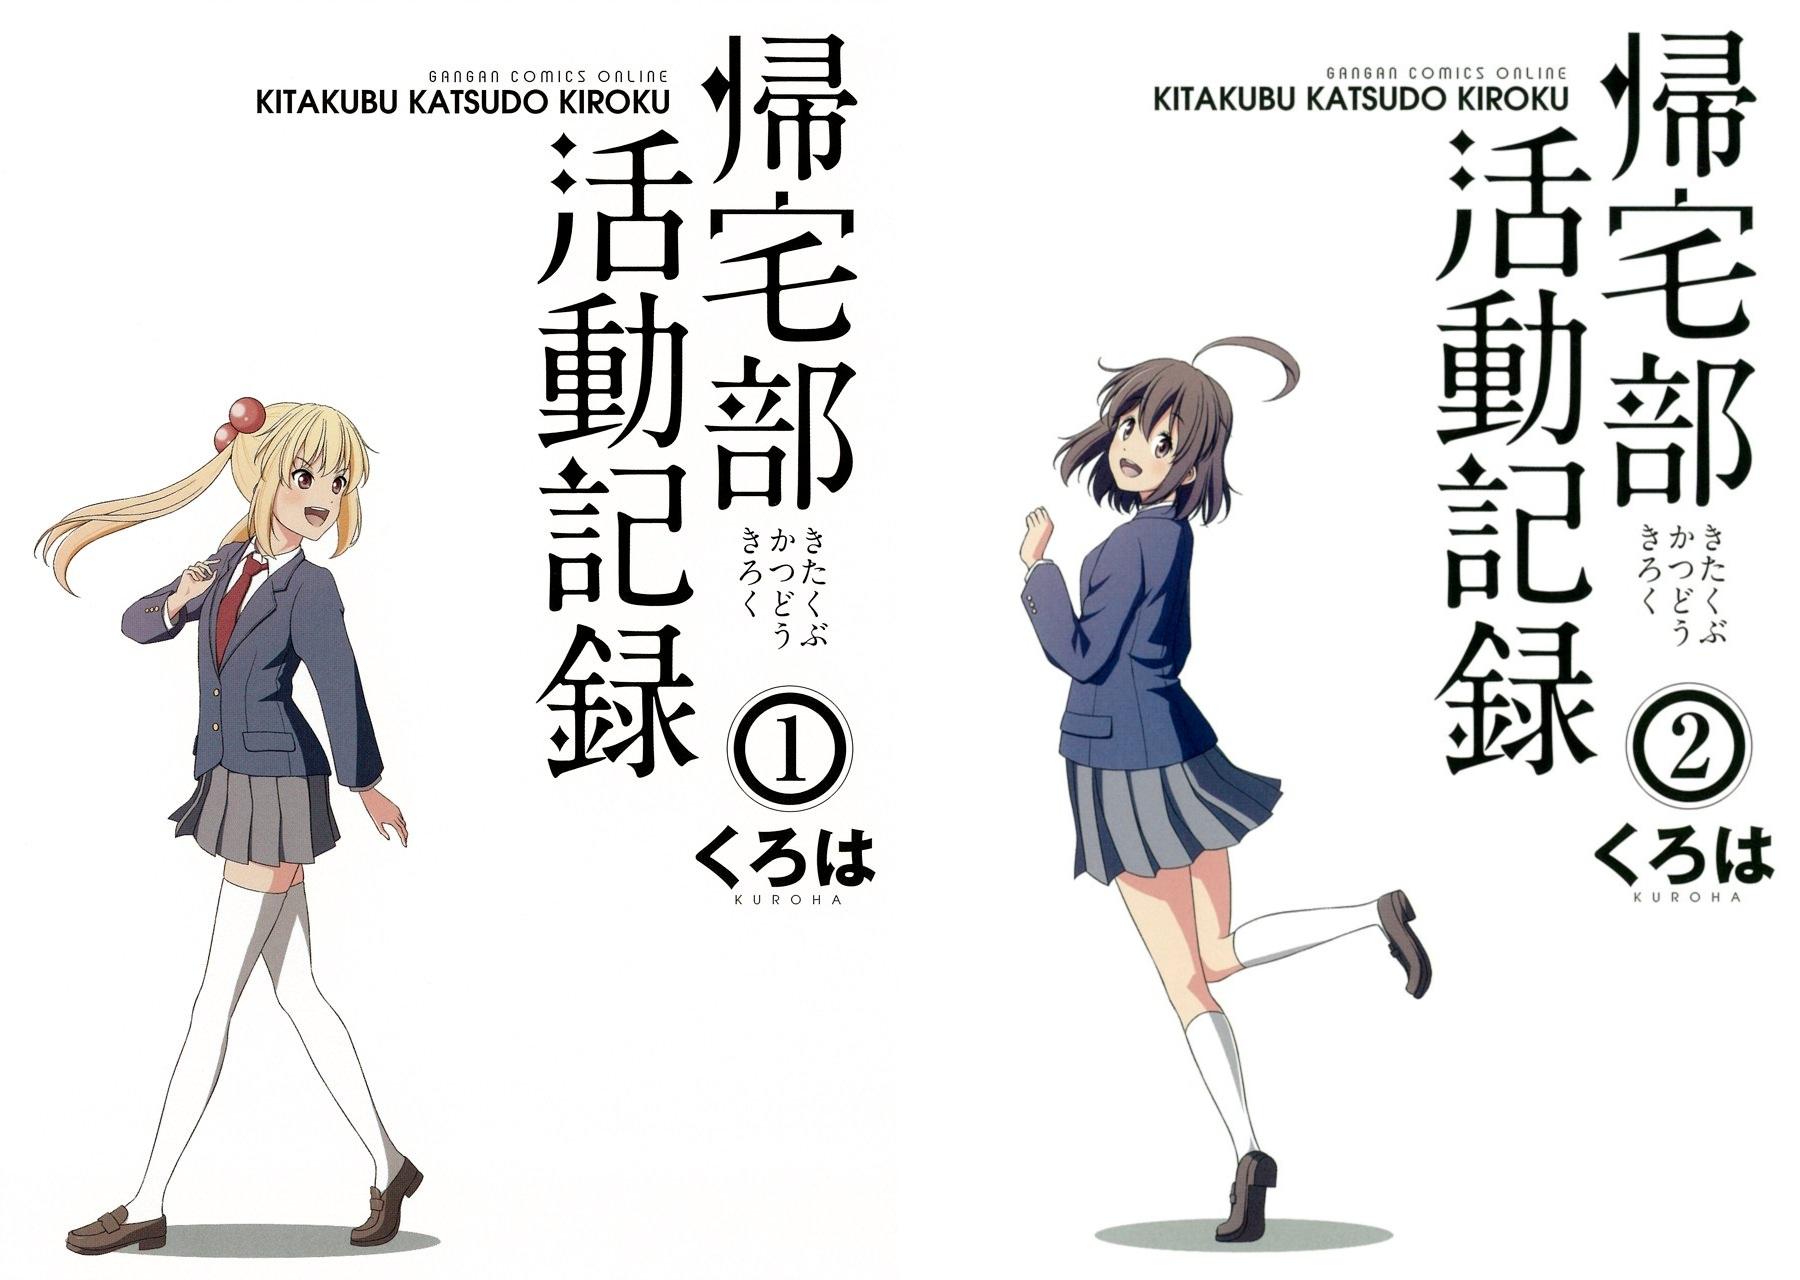 Couvertures mangas Kitakubu